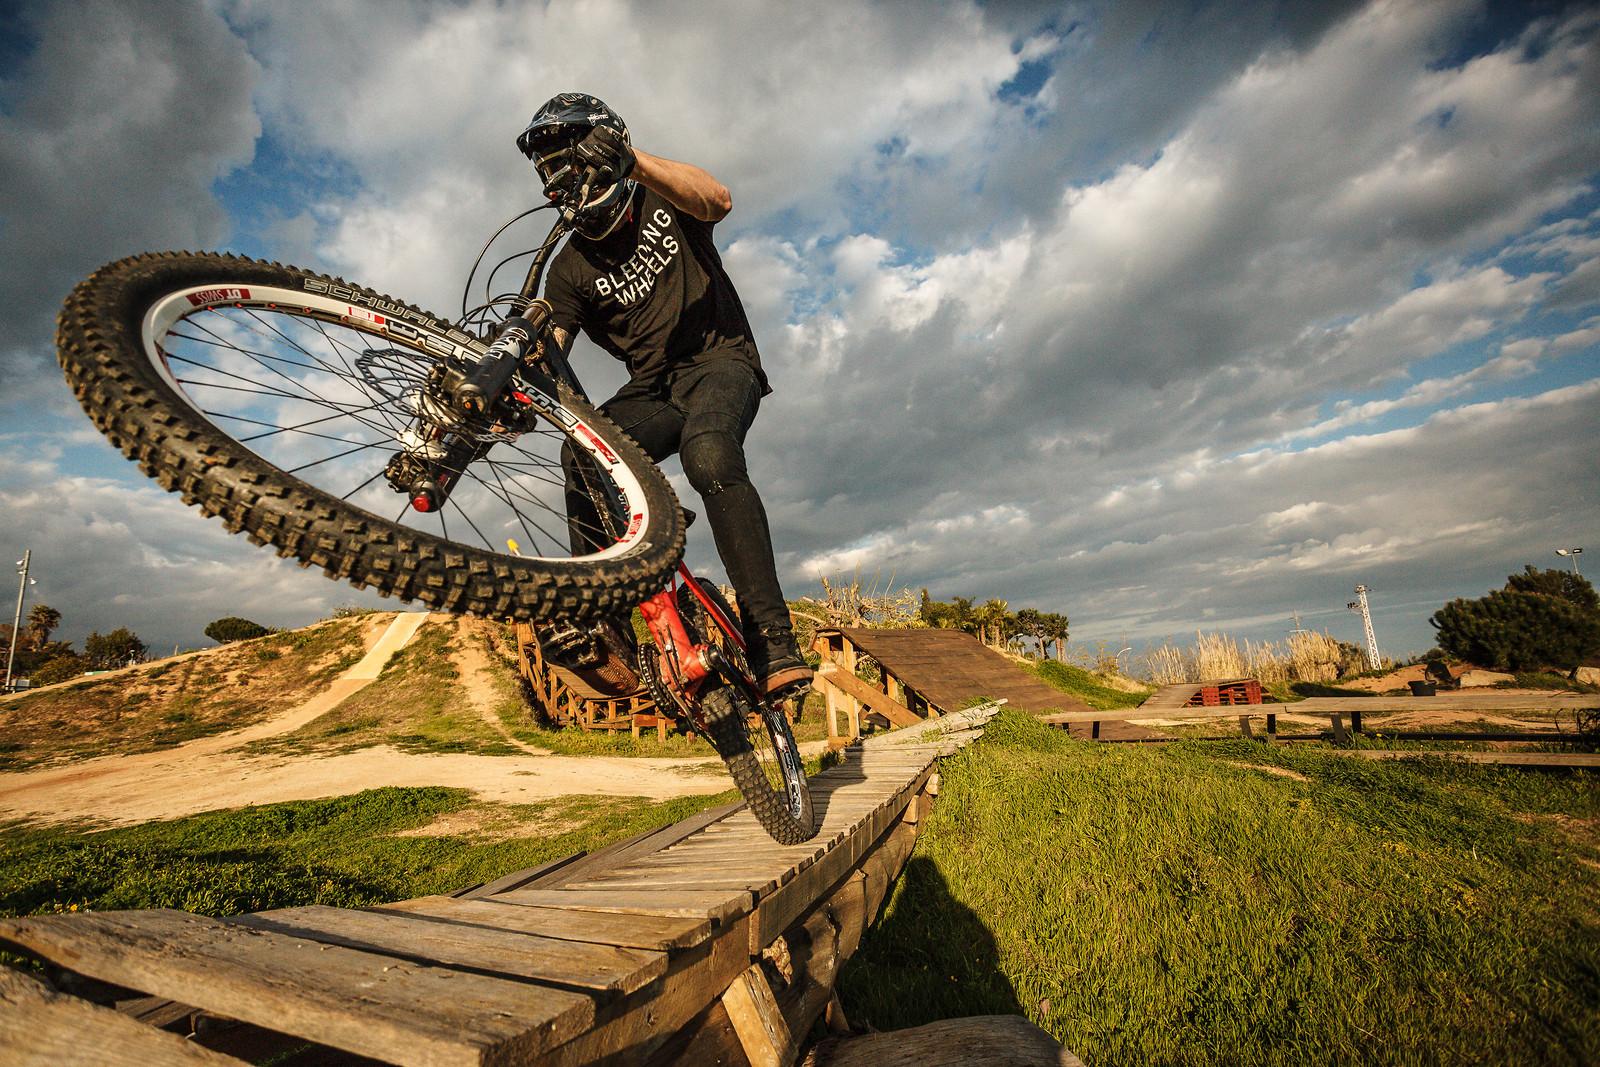 Hector Saura 1 - cristobal.batlle - Mountain Biking Pictures - Vital MTB